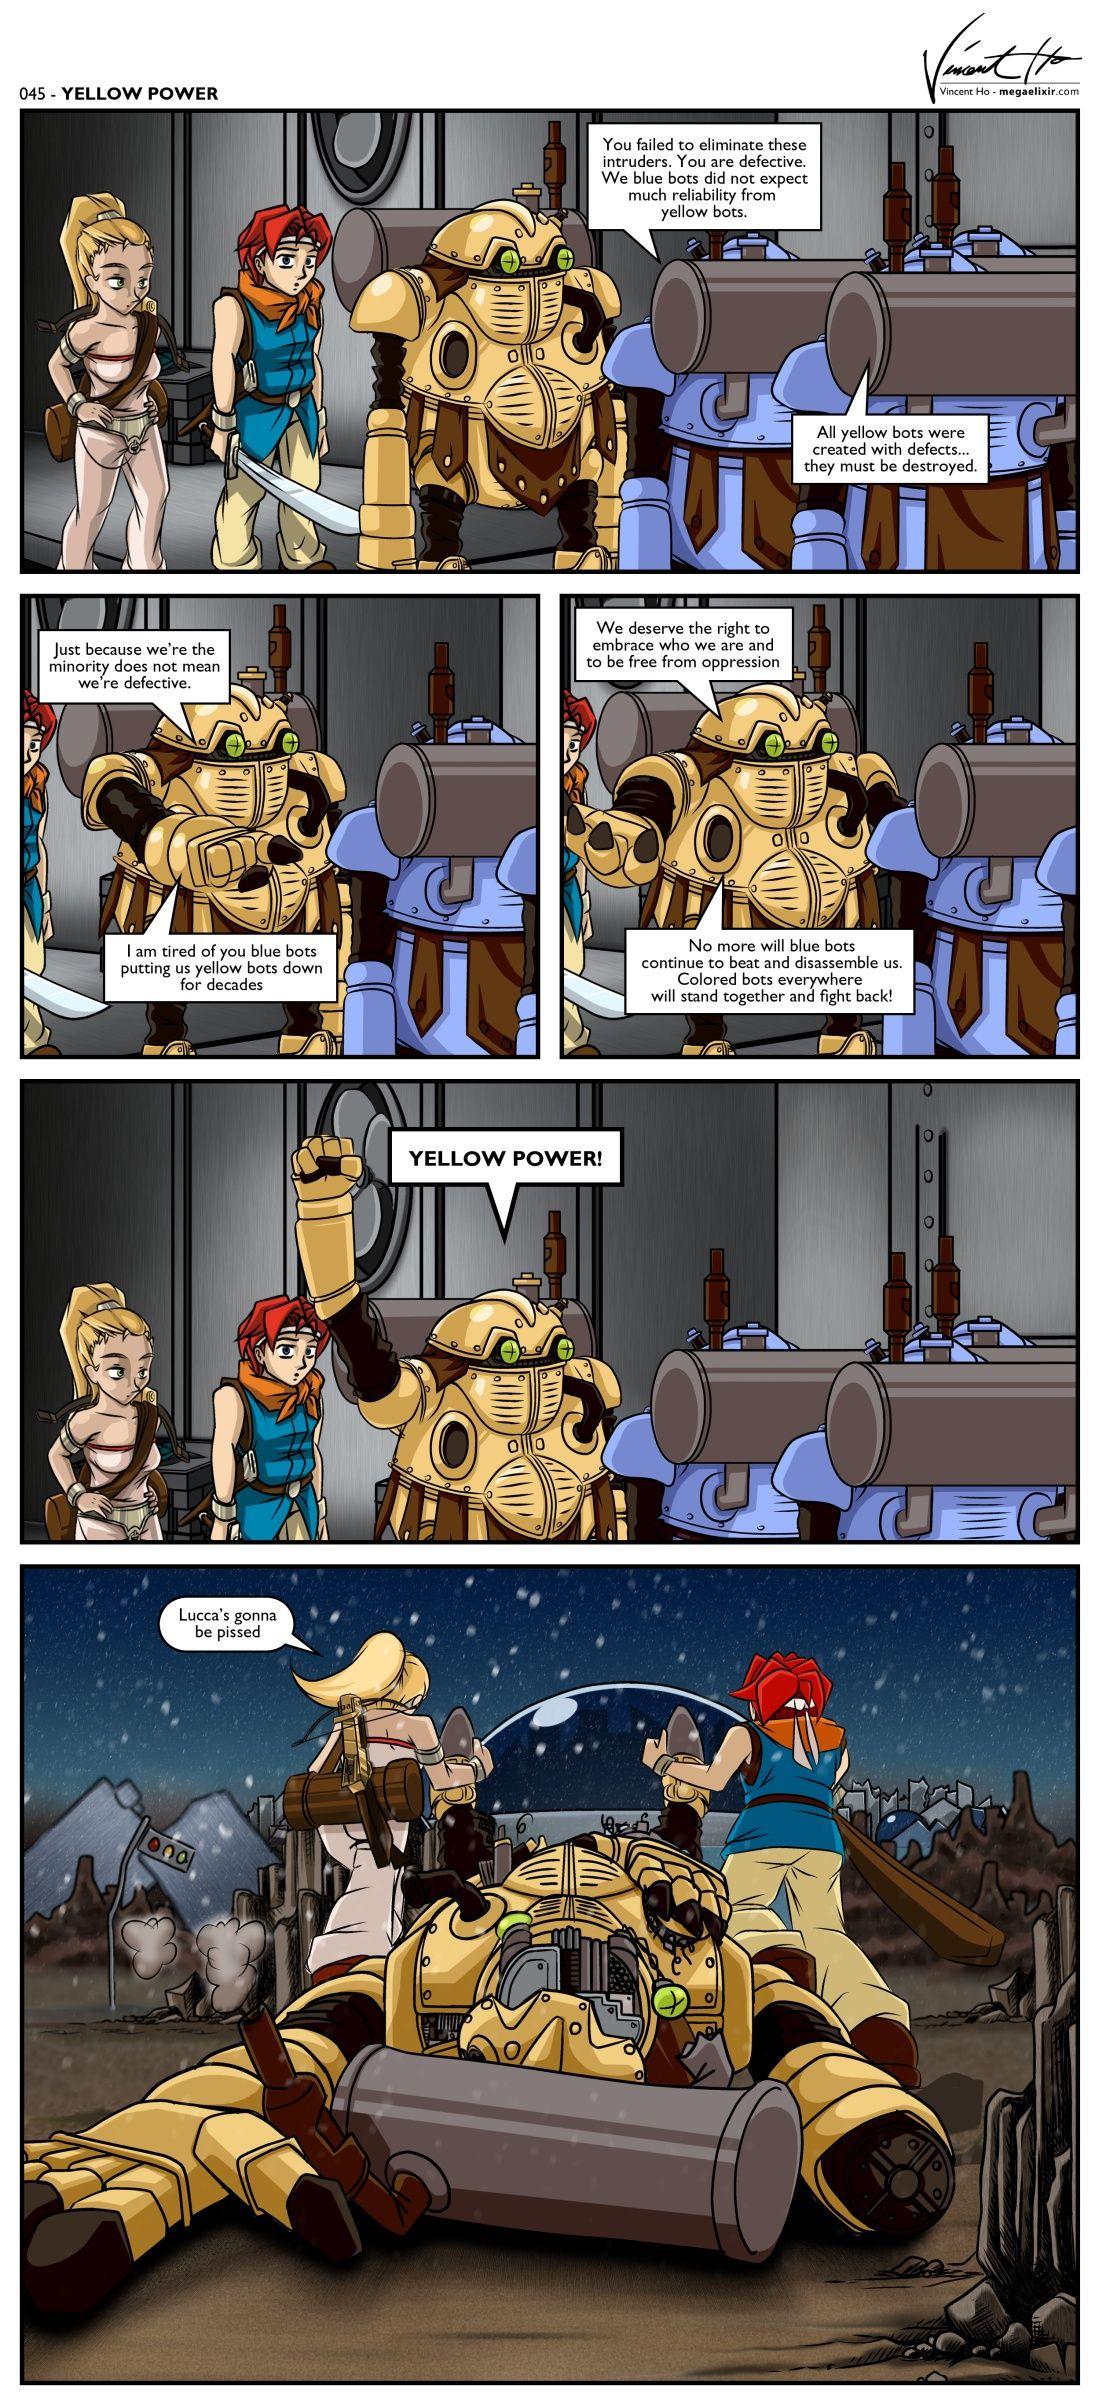 Chrono Trigger Comics   WebComics   Chrono trigger, Chrono cross